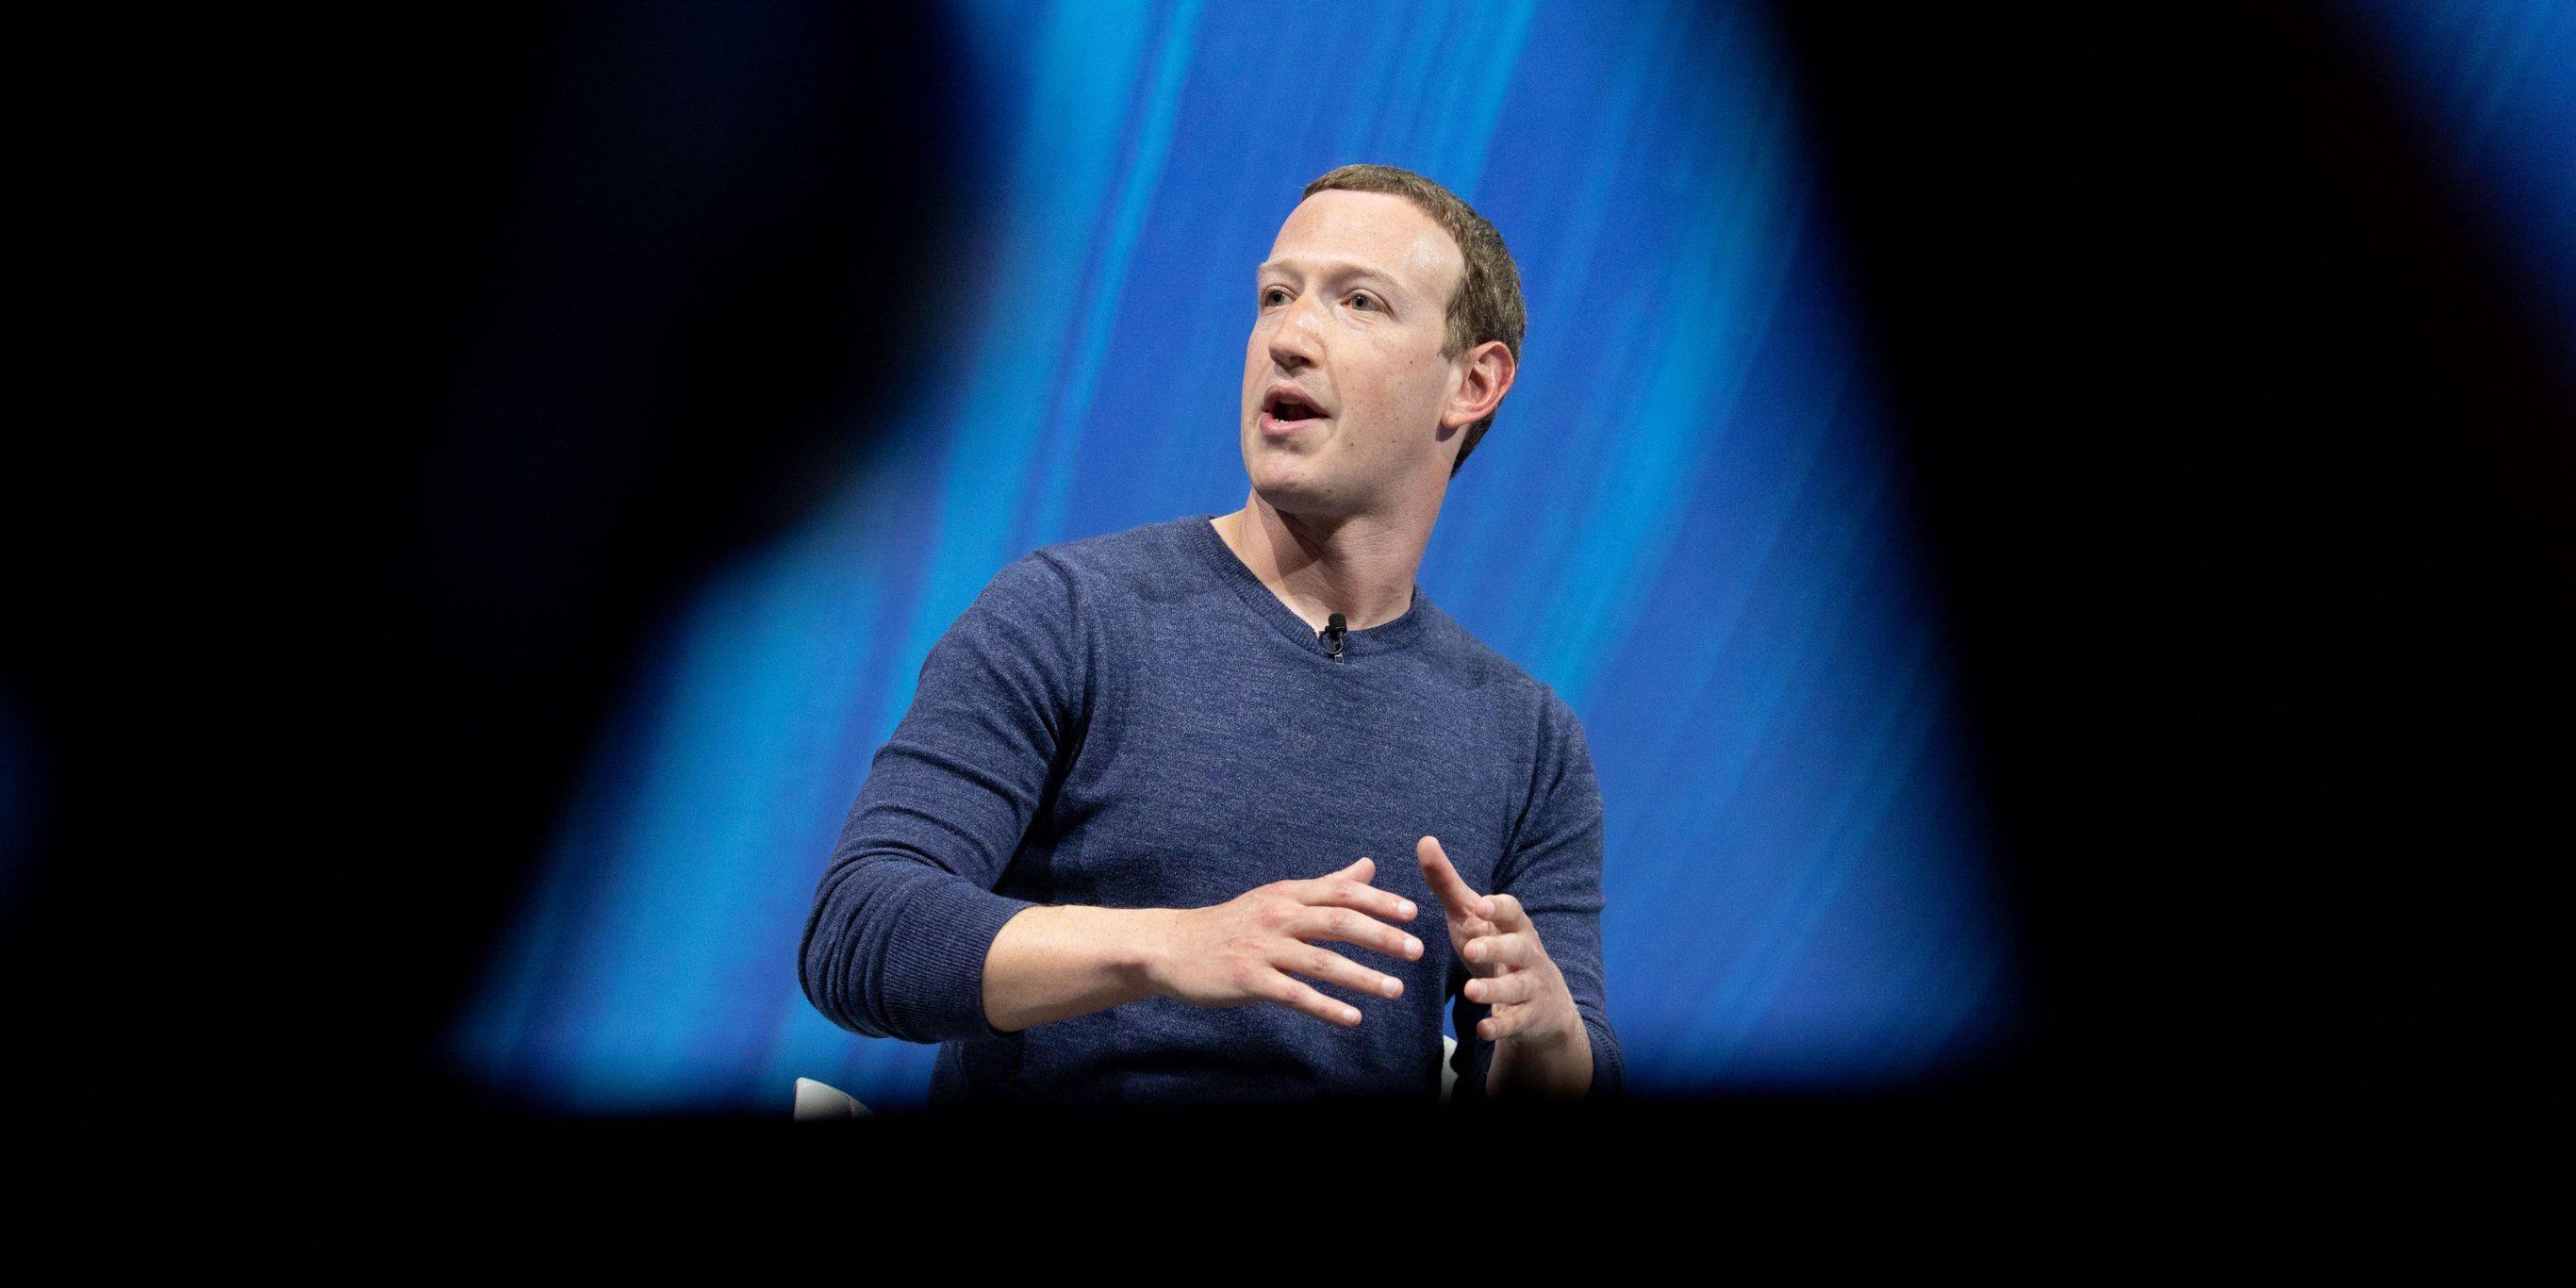 Facebook gets slammed by new lawsuit from DOJ accusing it